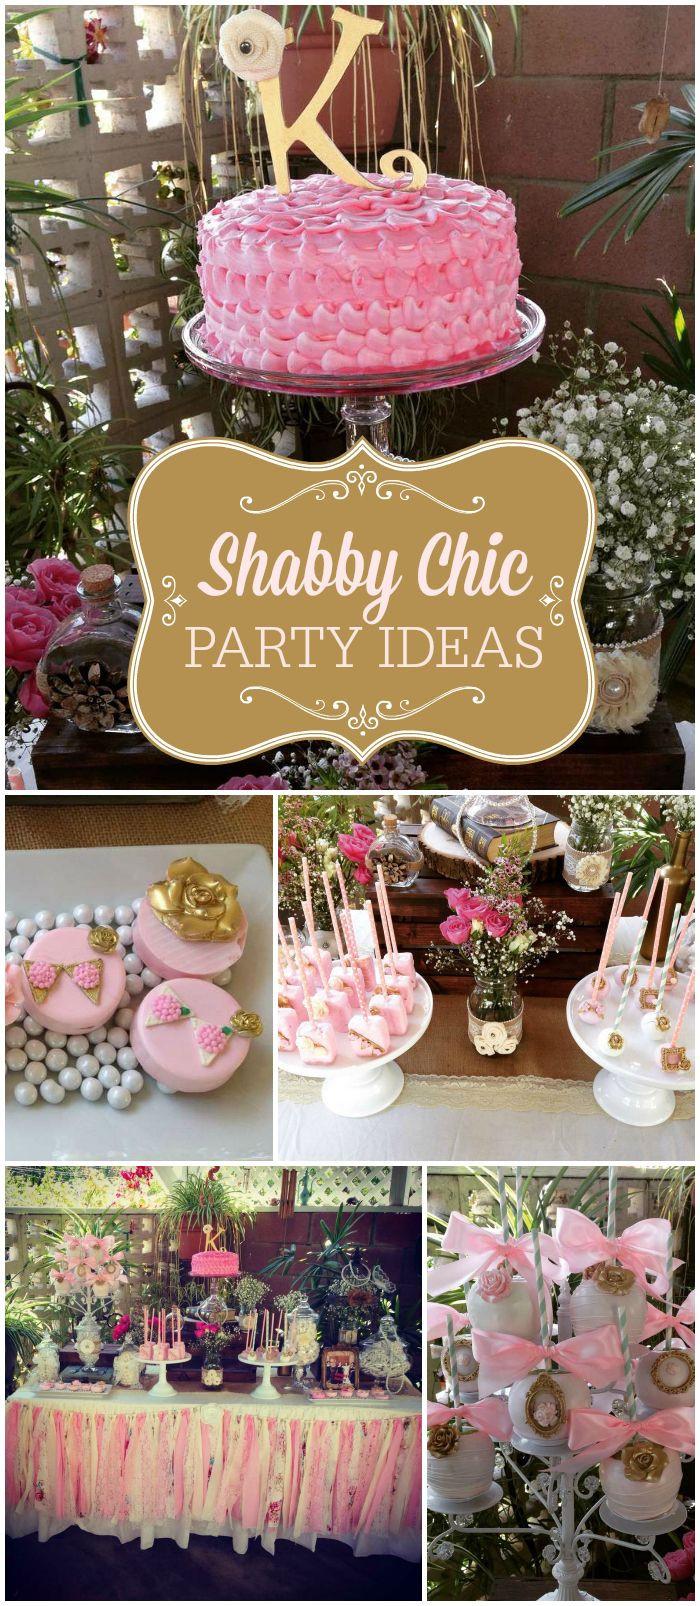 Shabby Chic Birthday Decorations  Best 25 Shabby chic cakes ideas on Pinterest